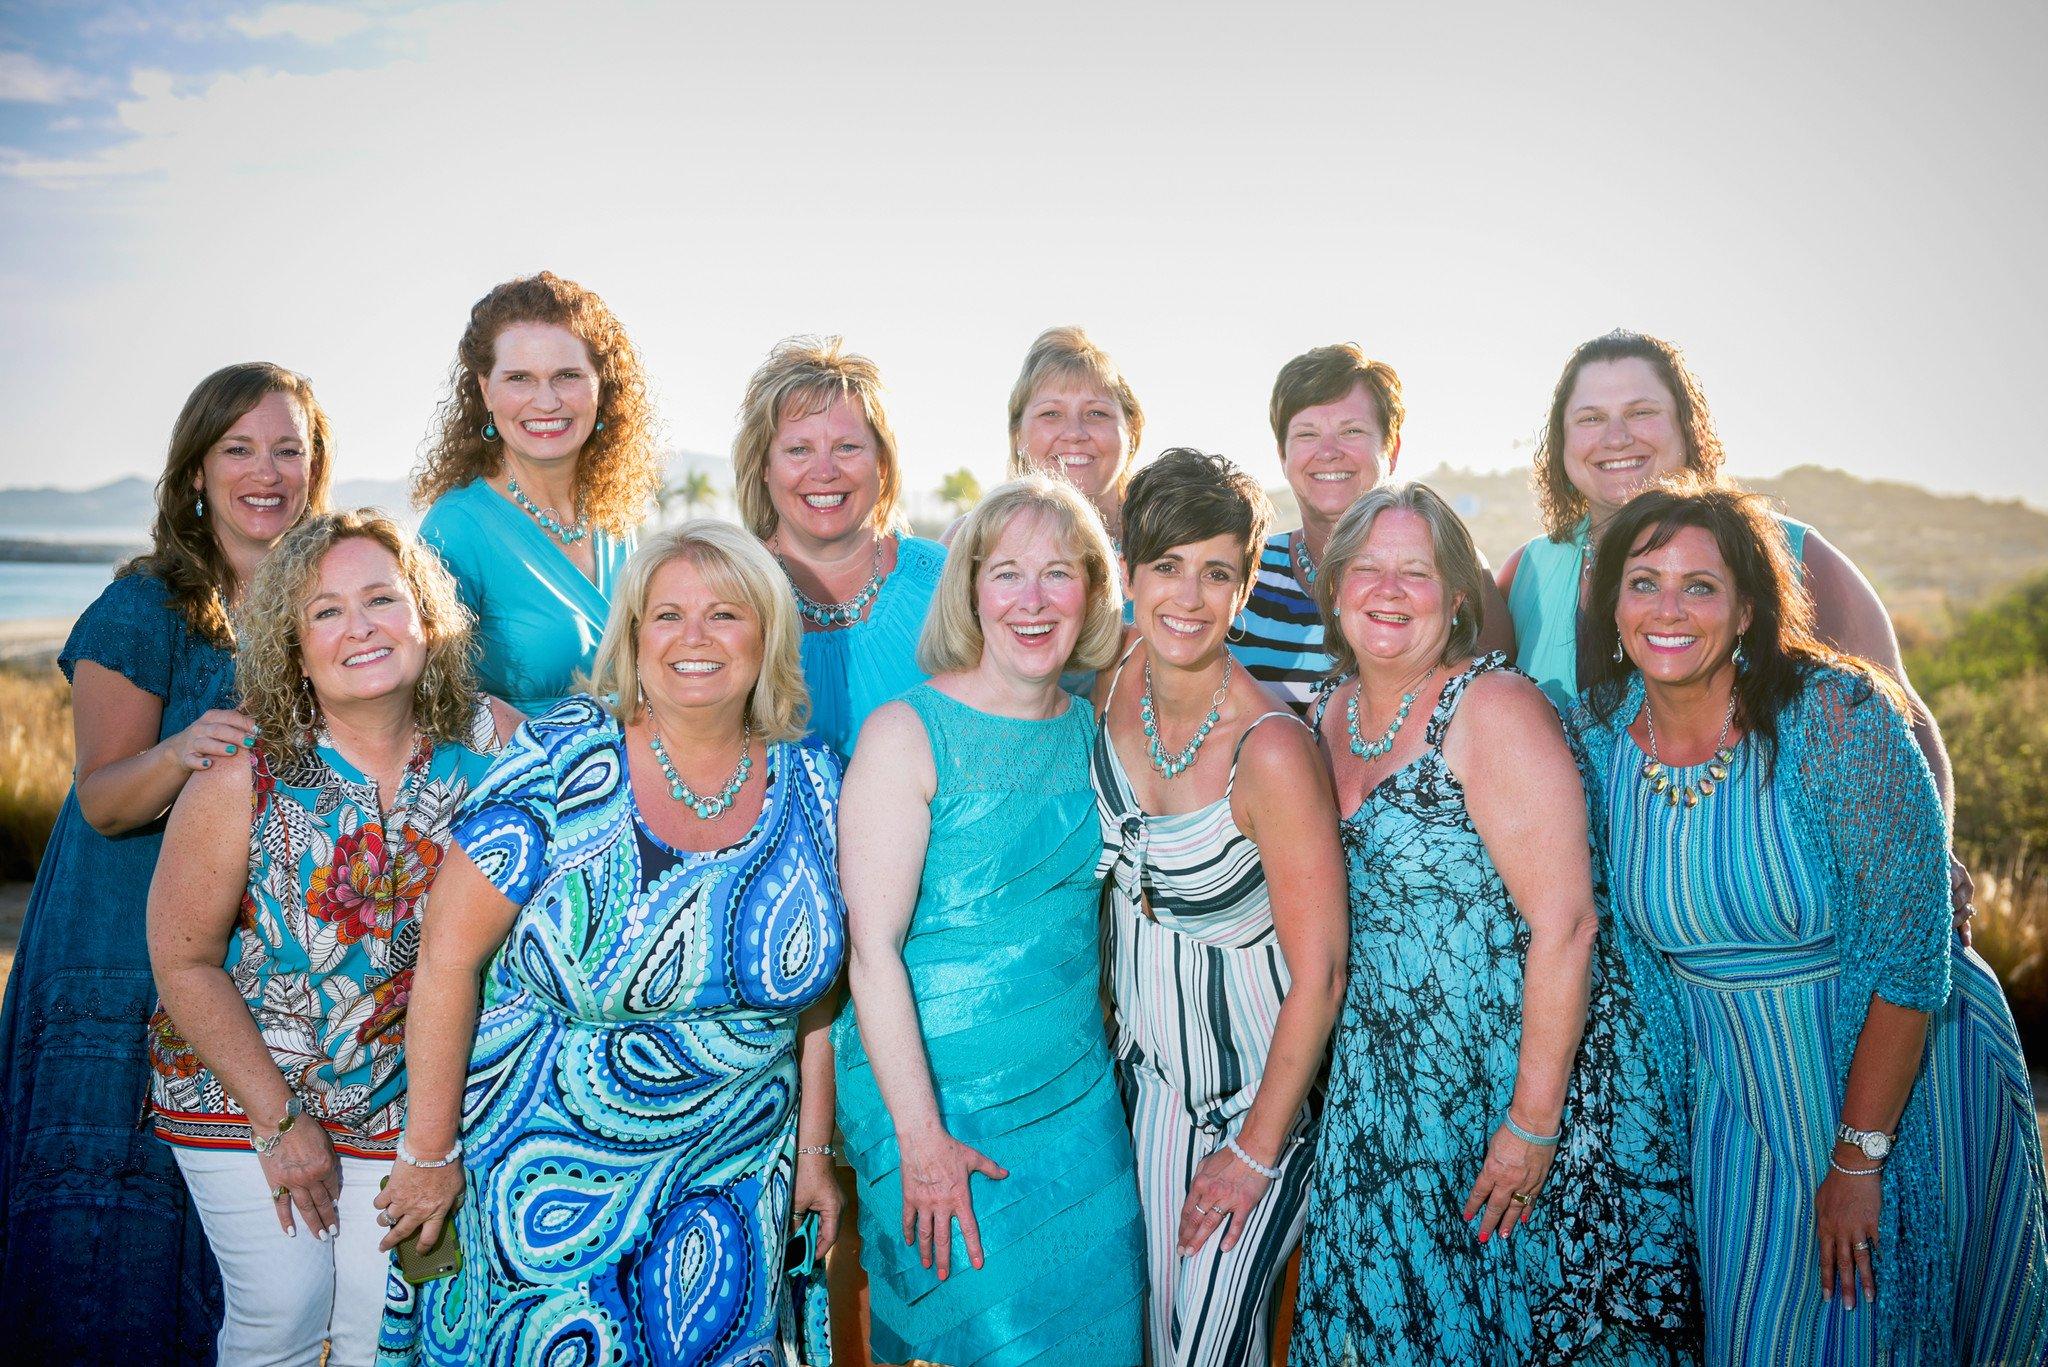 Several Team Empower Leaders. Left to right: Marlisa, Marianna, Madelyn, Tami, Pam, Cheryl, Melody, Sheri, Kim, Sheralyn, Lori, Bridget